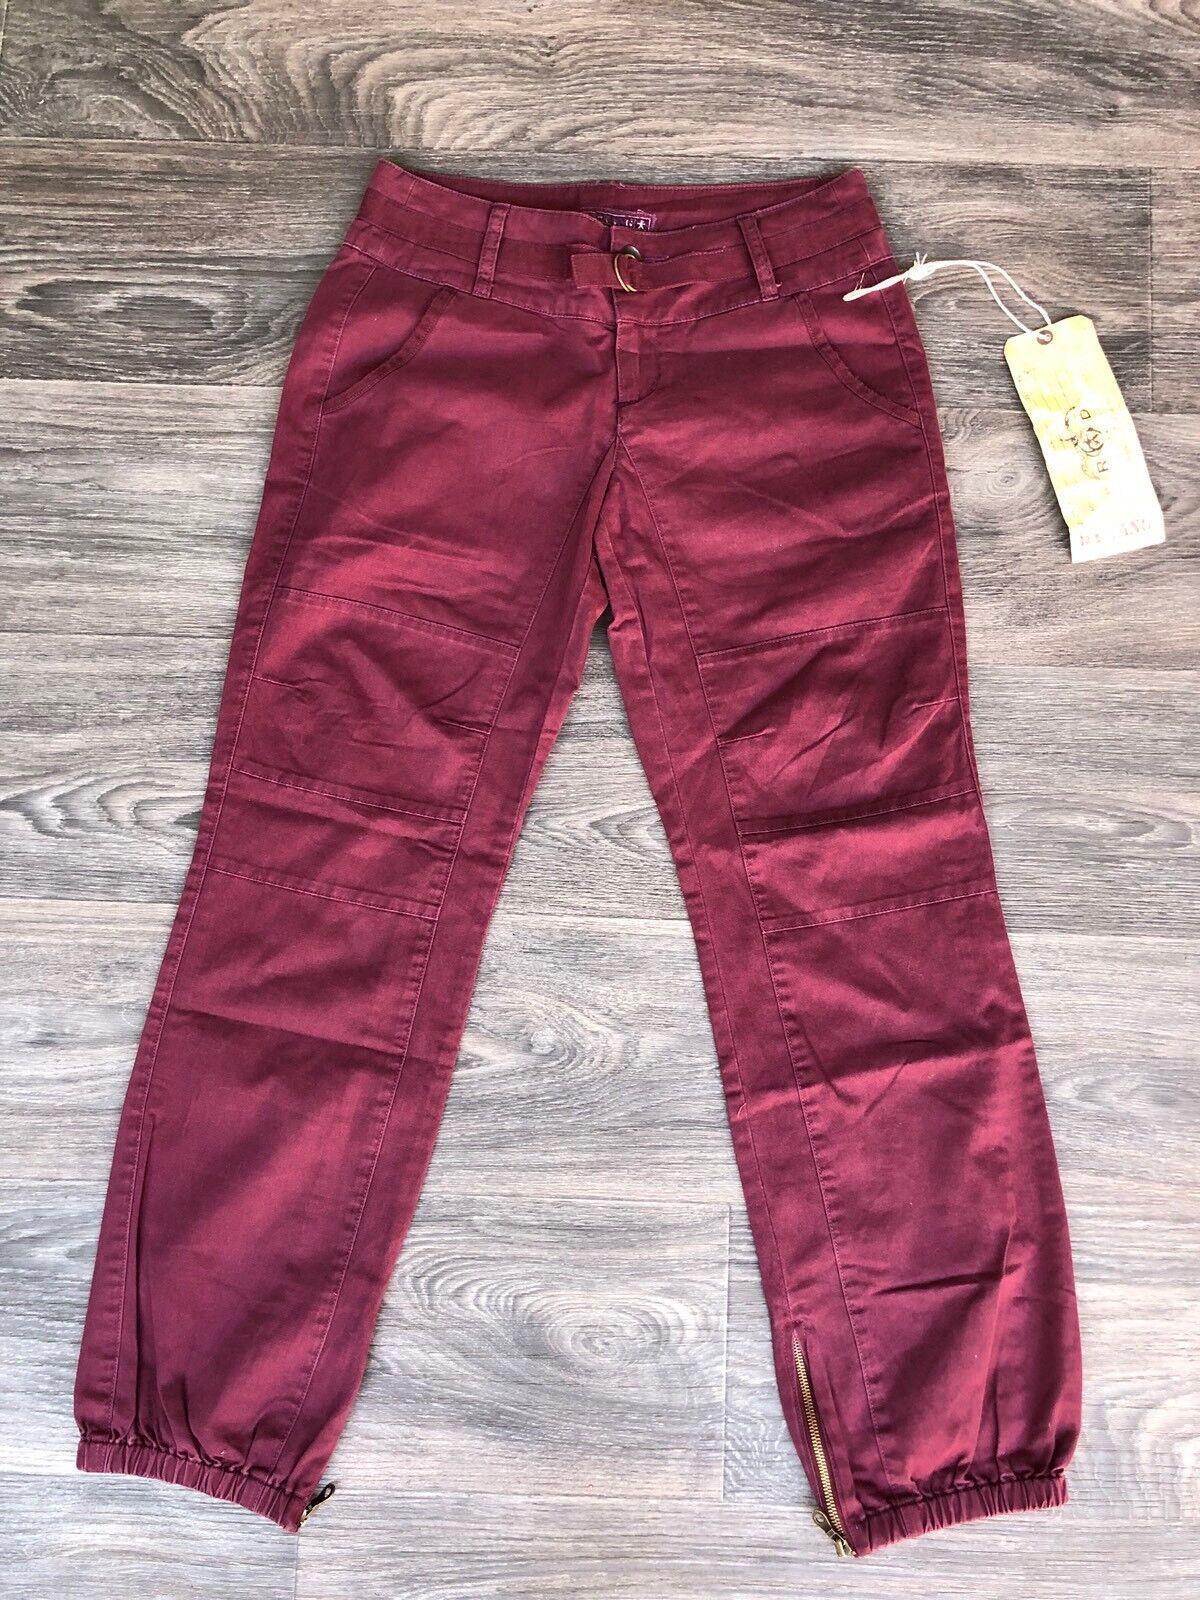 NWT Da Nang Women's Cotton Cargo Pants Elastic Ankle Grape Burgundy